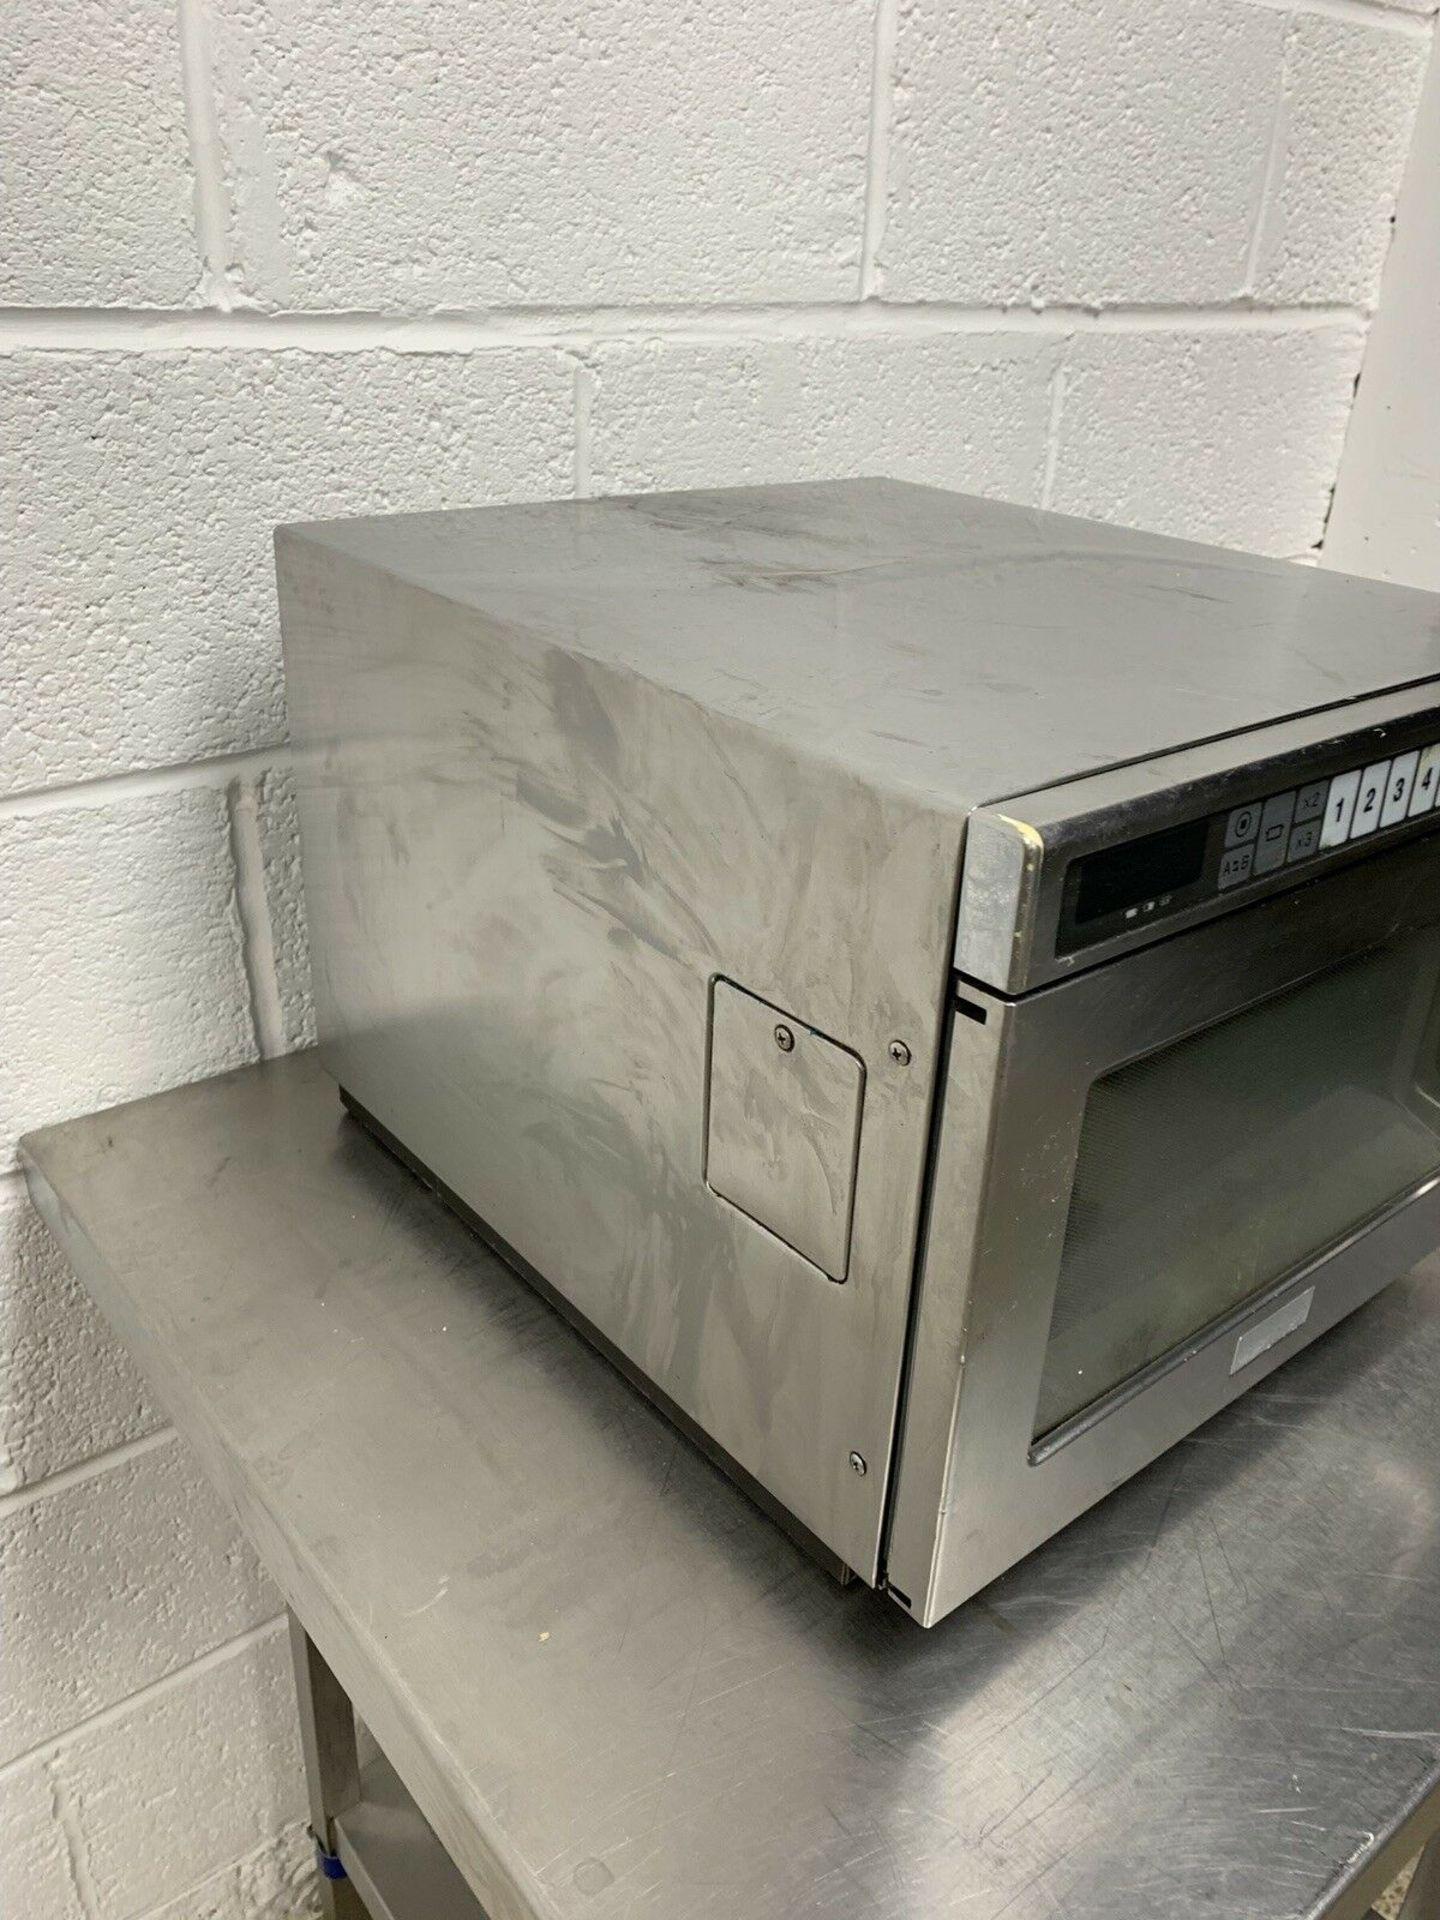 Lot 93 - Panasonic Microwave Oven